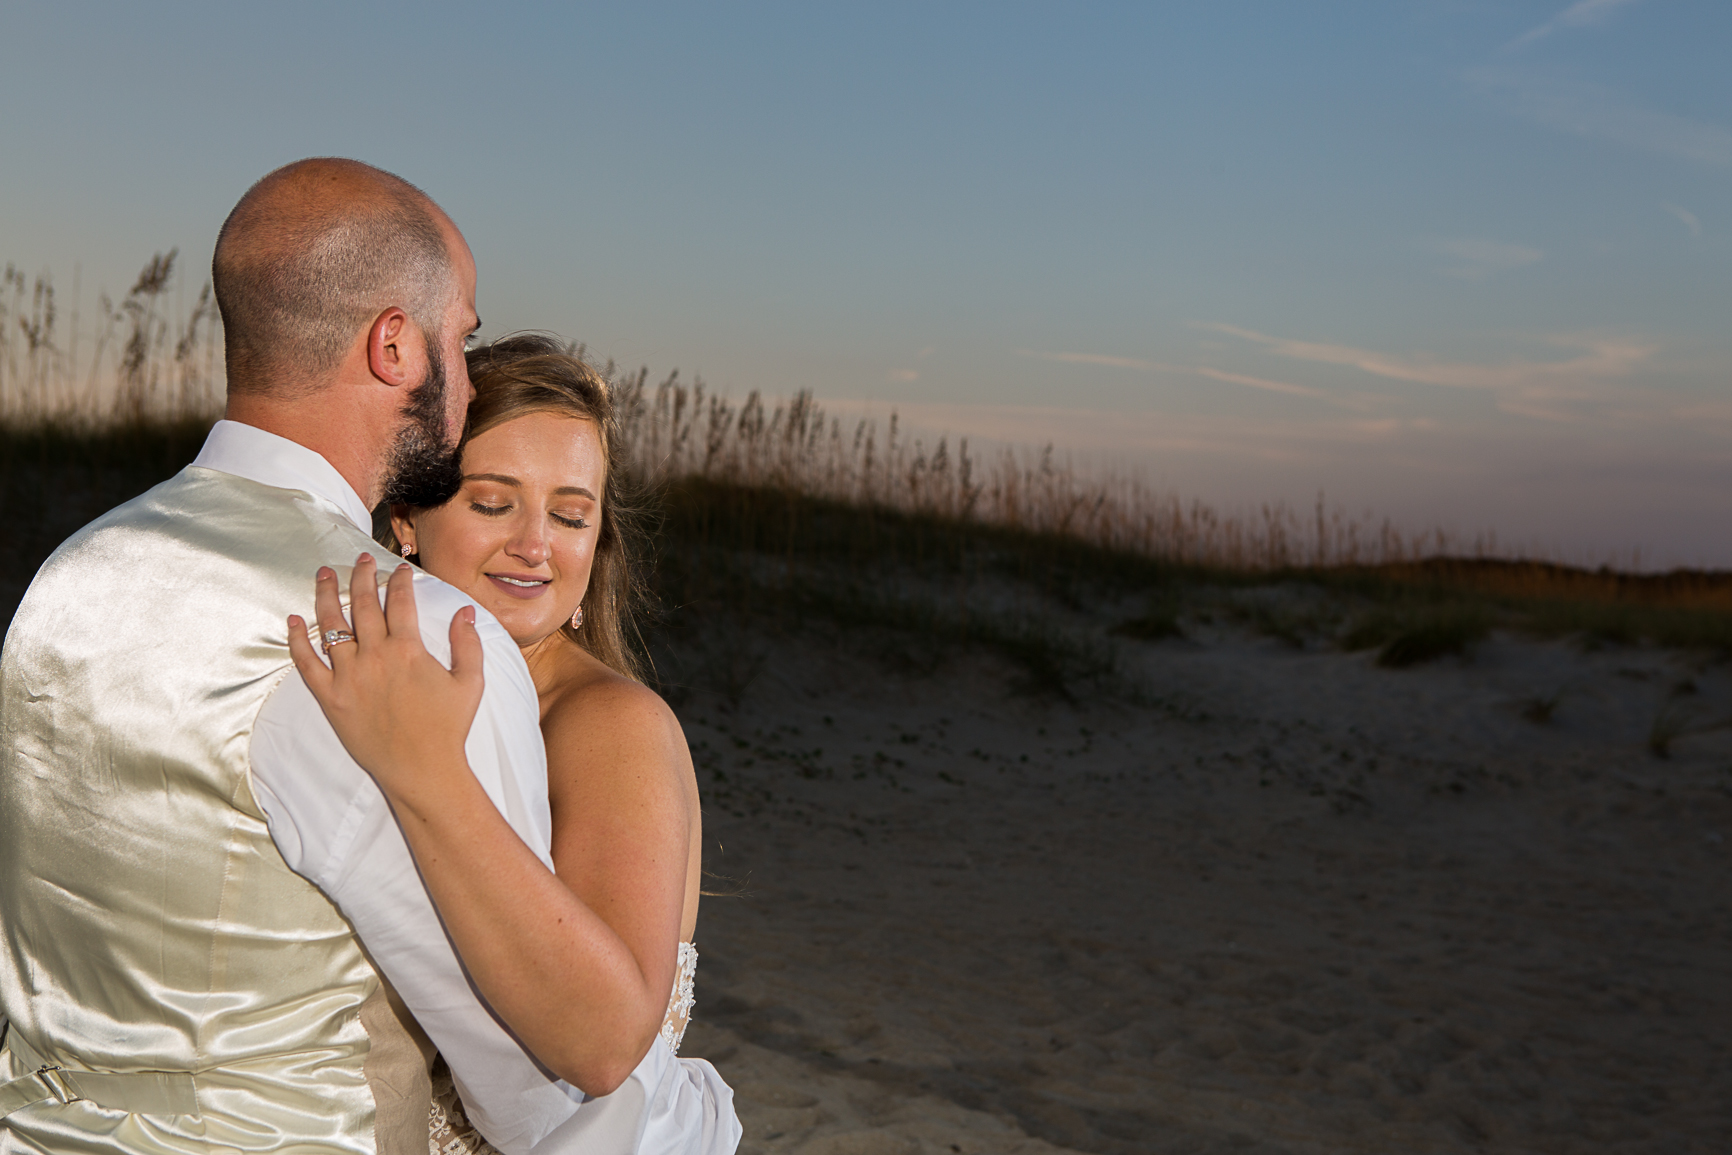 Raleigh wedding photographer - 101 studio llc -15.jpg